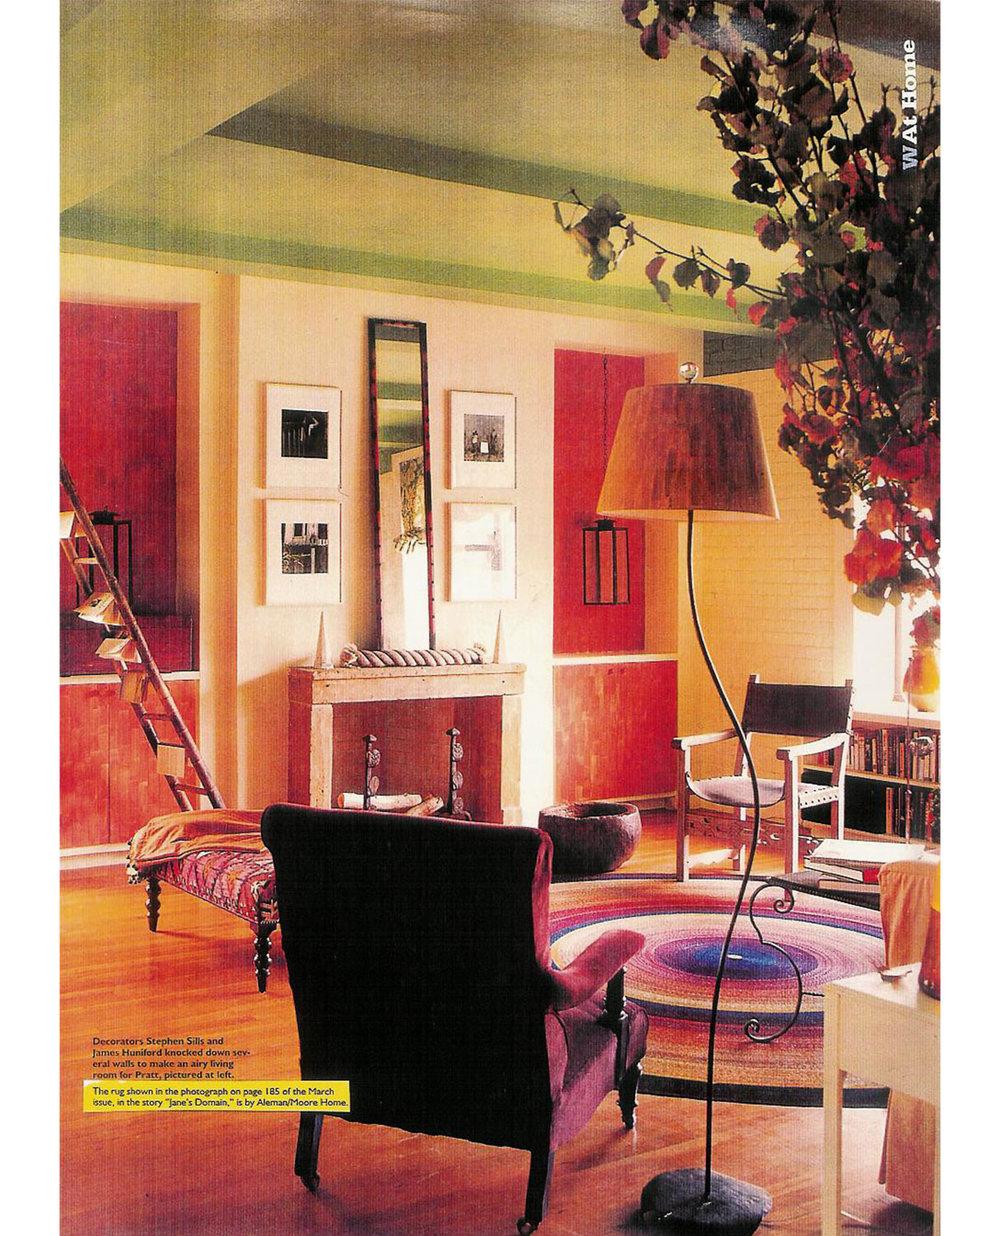 Wmagazine1996-p2_alemanmoore.jpg